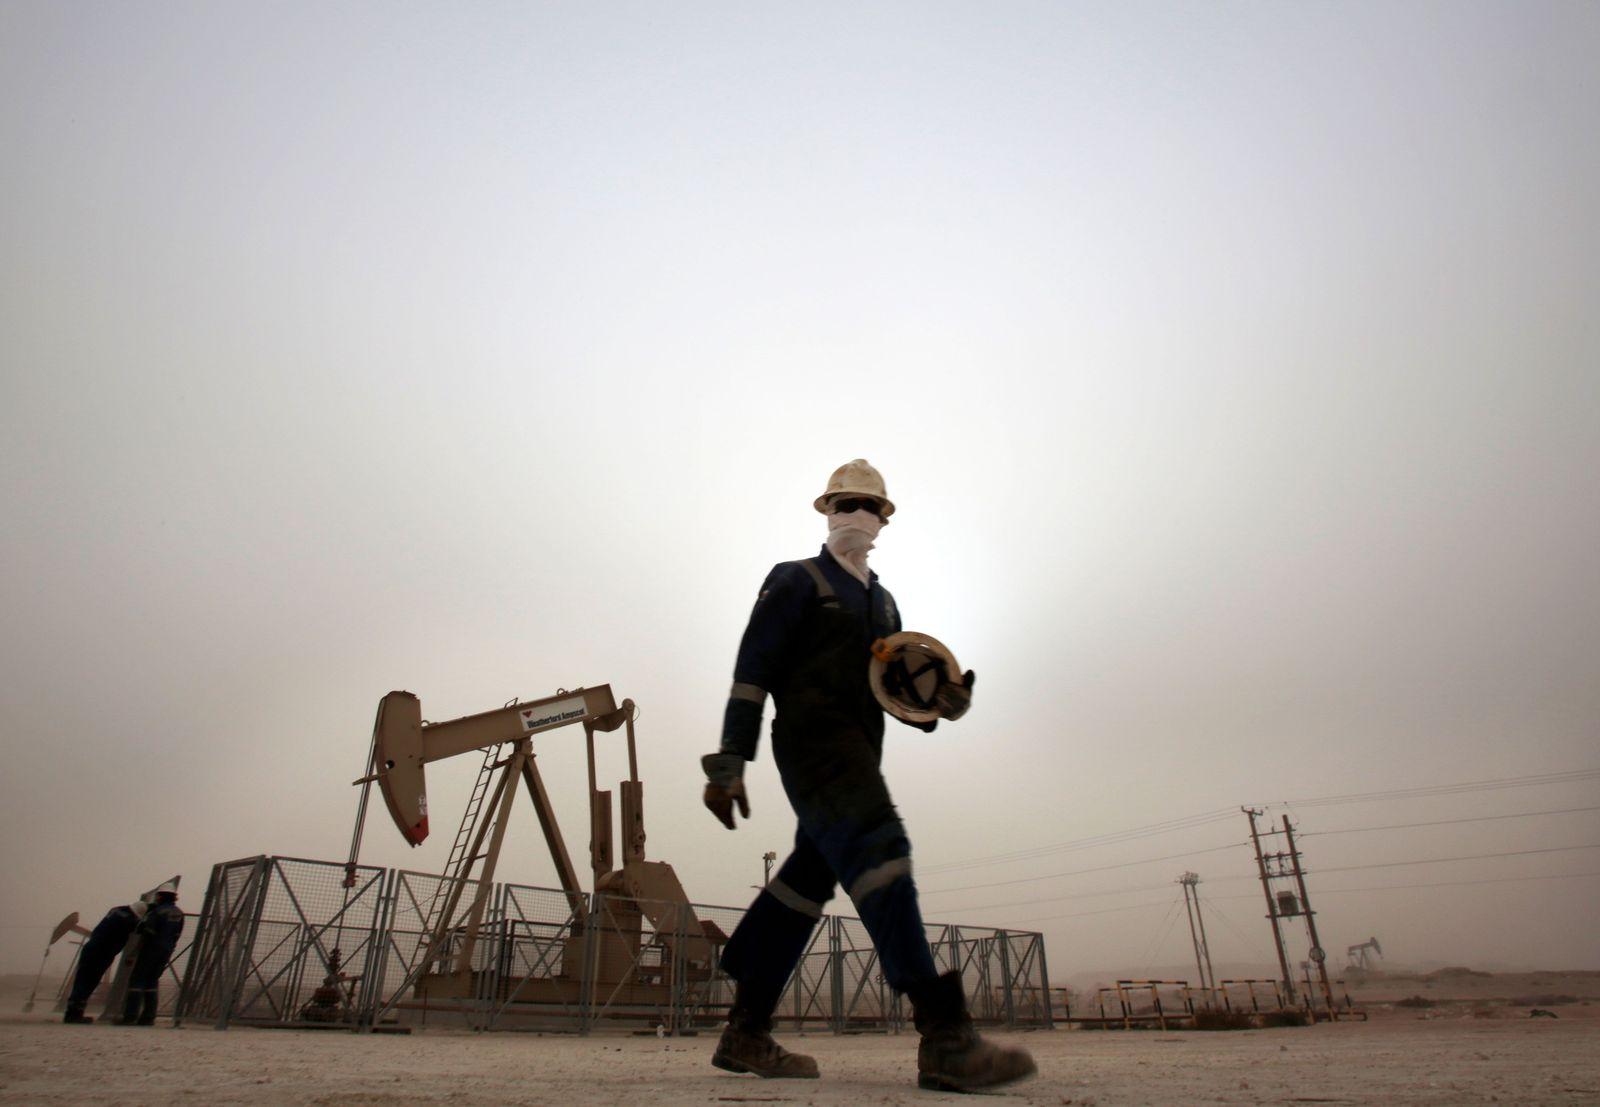 Ölpreis / Öl / Öl-Krise / Mideast Oil